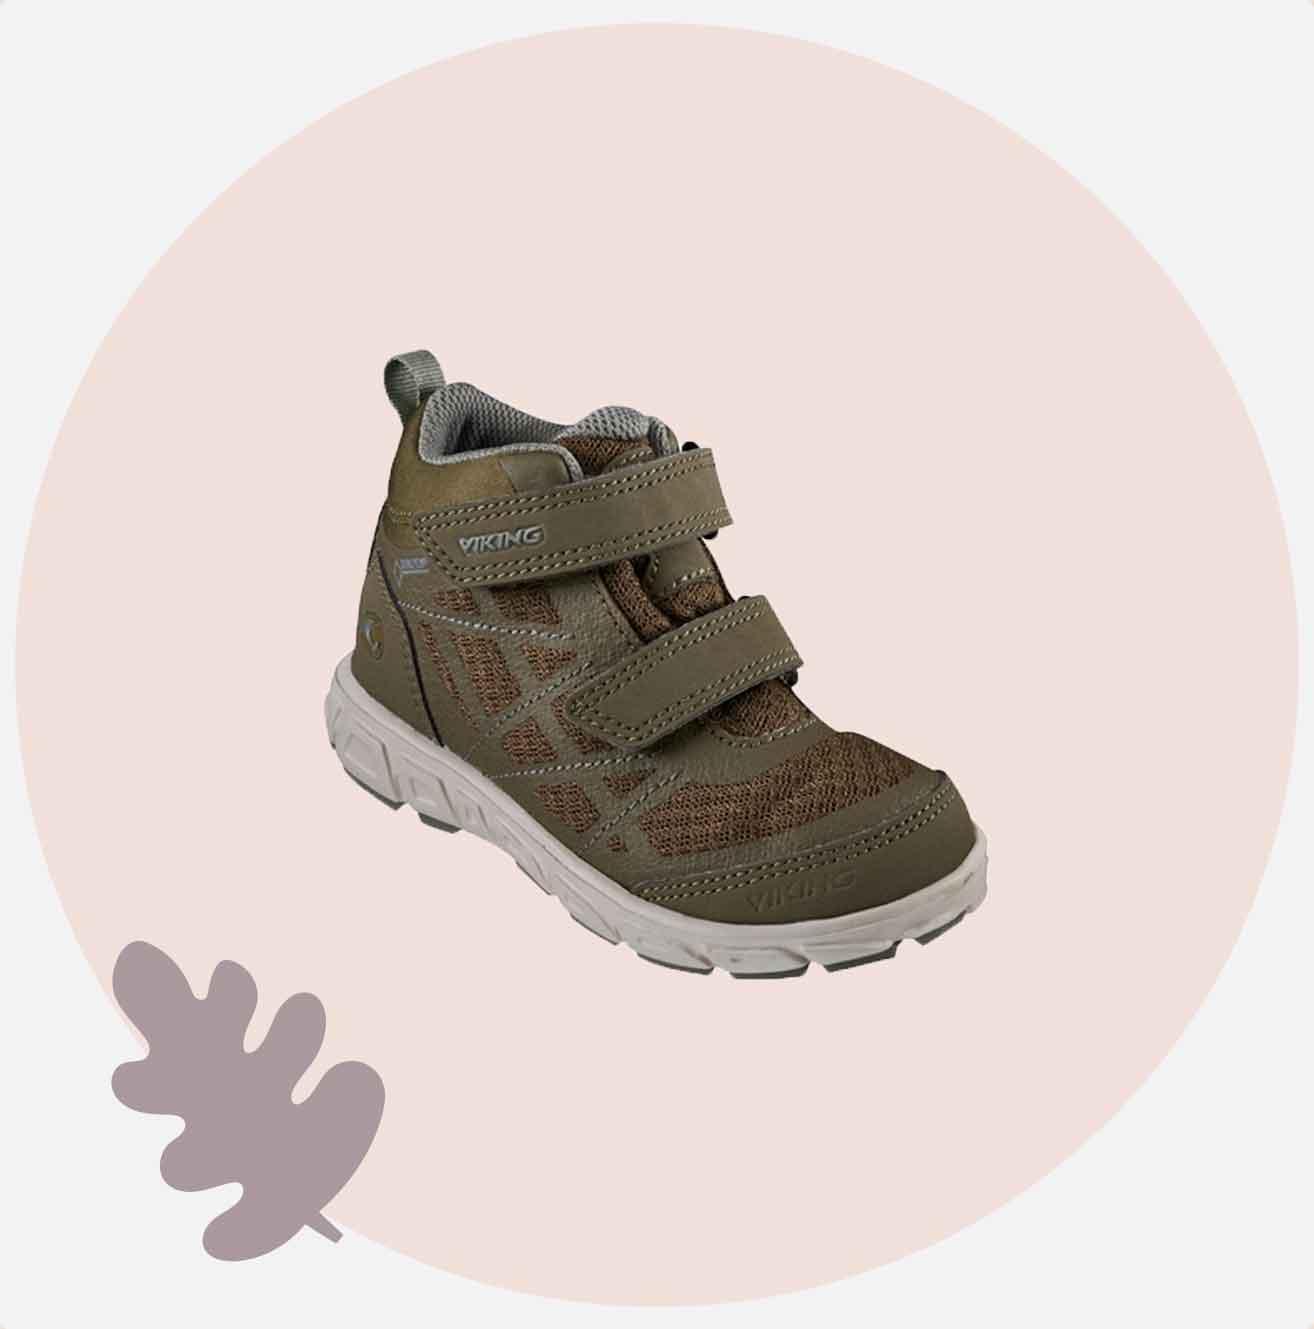 Skechers, Barn, sko Nordens største utvalg av sko | FOOTWAY.no